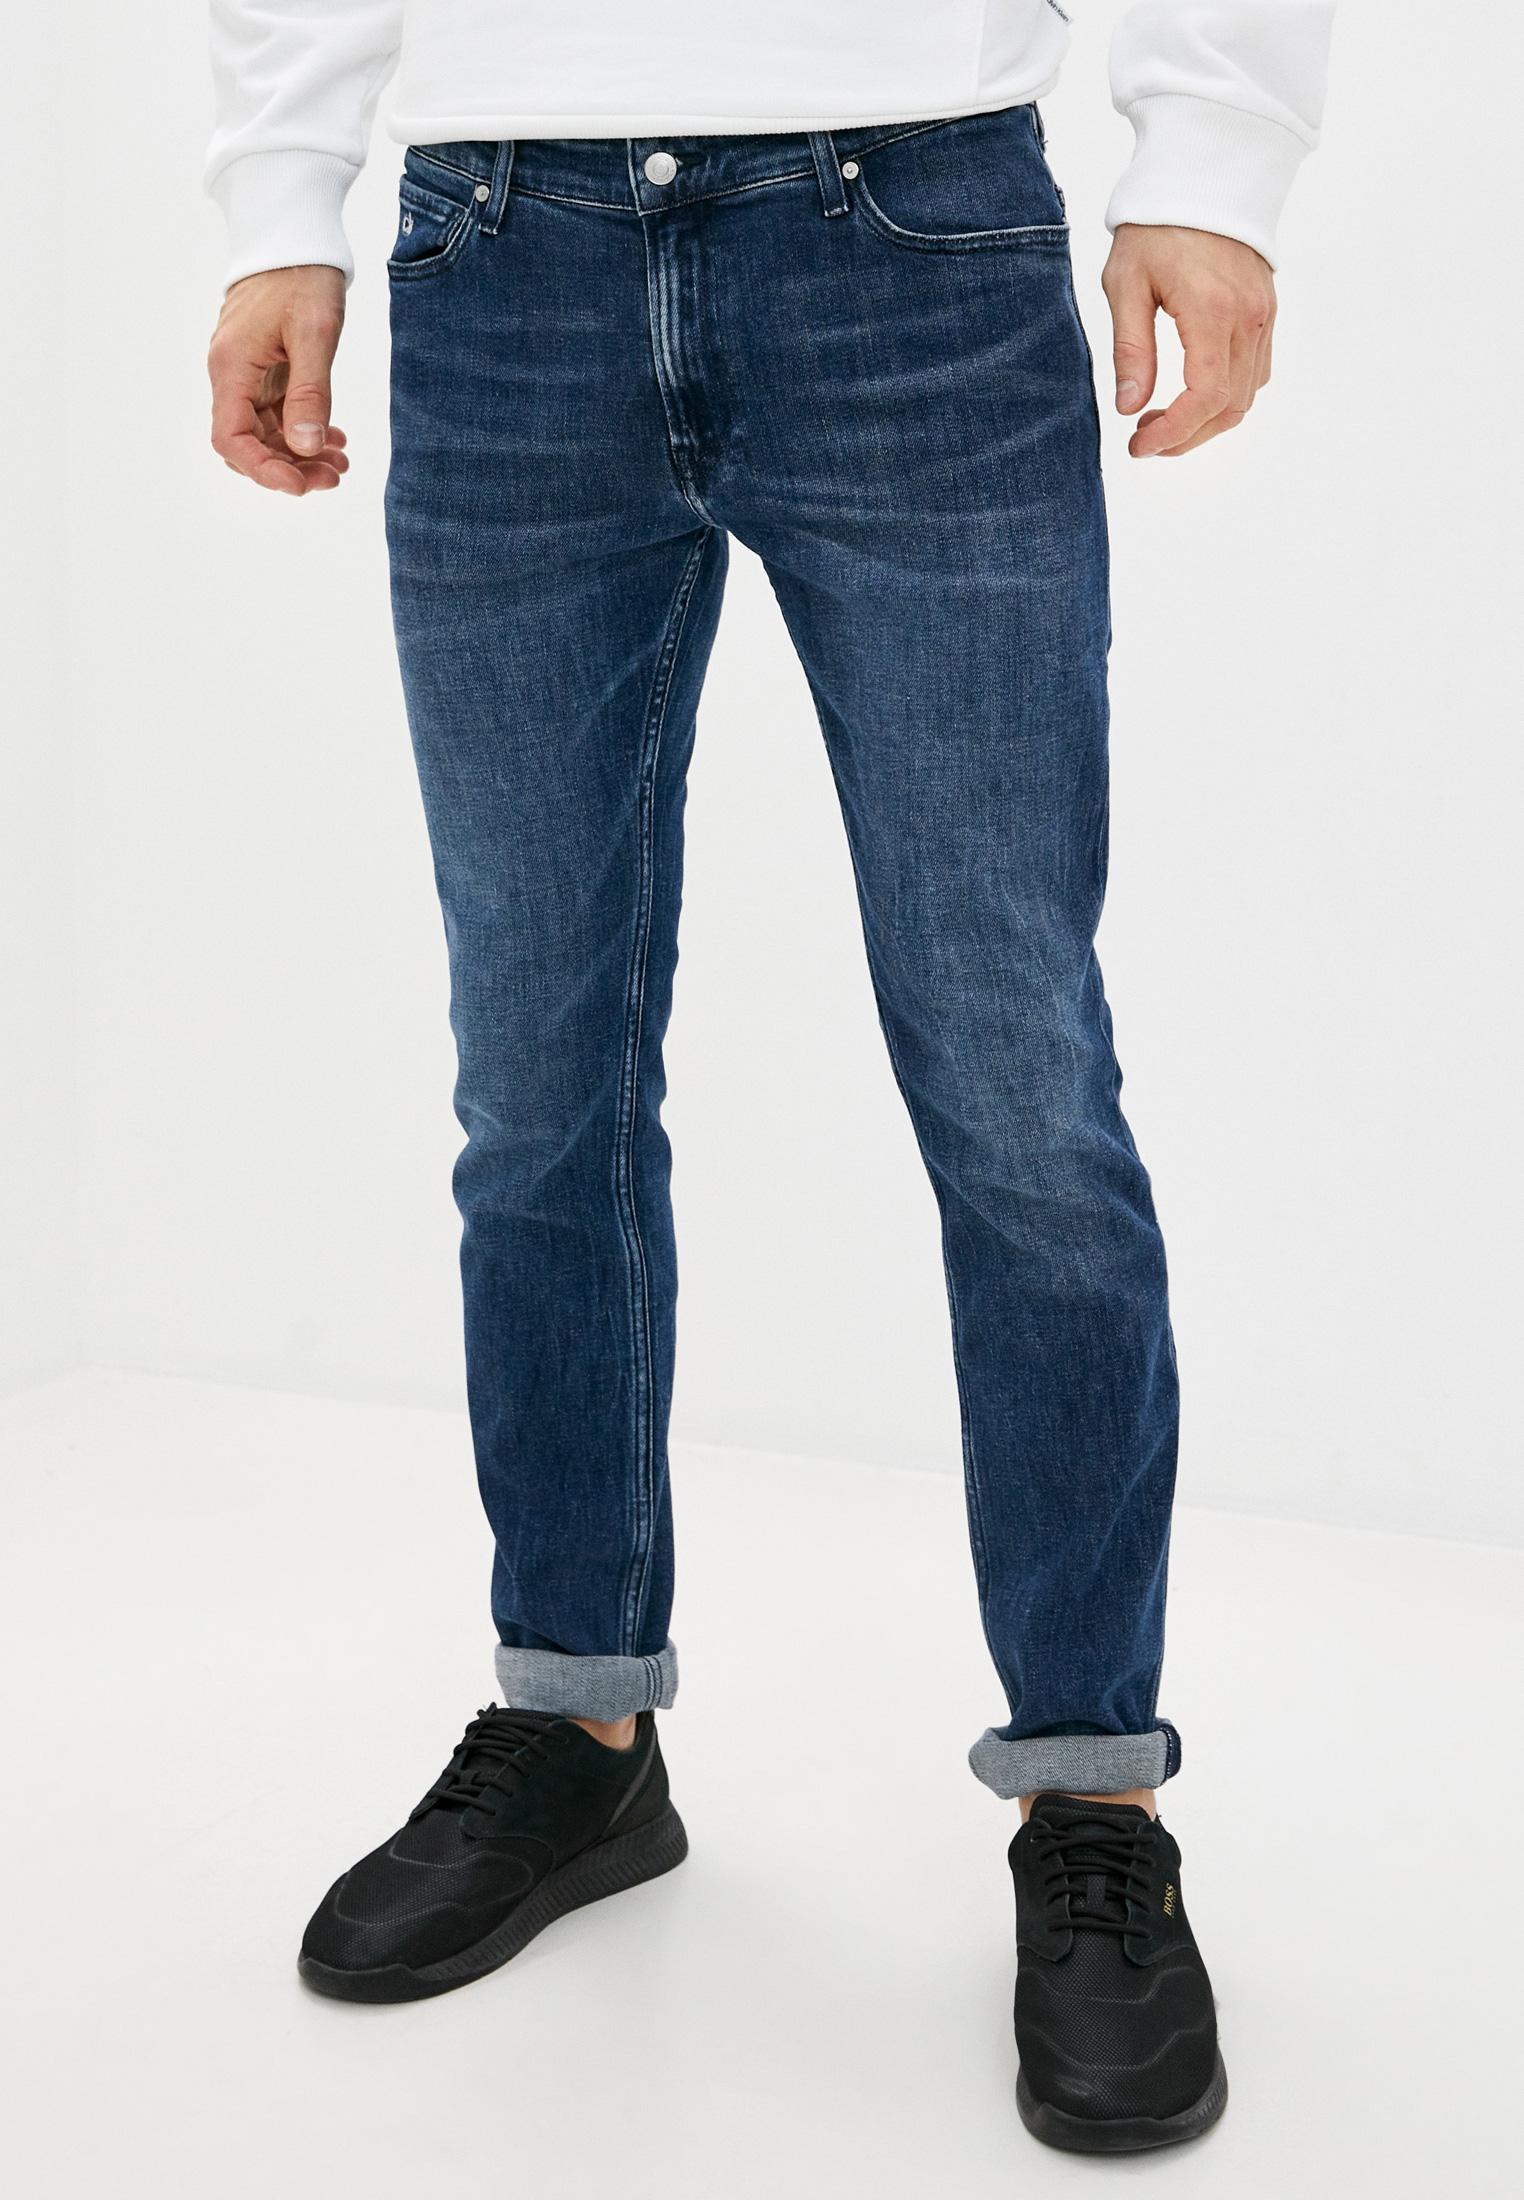 Мужские зауженные джинсы Calvin Klein (Кельвин Кляйн) K10K106445